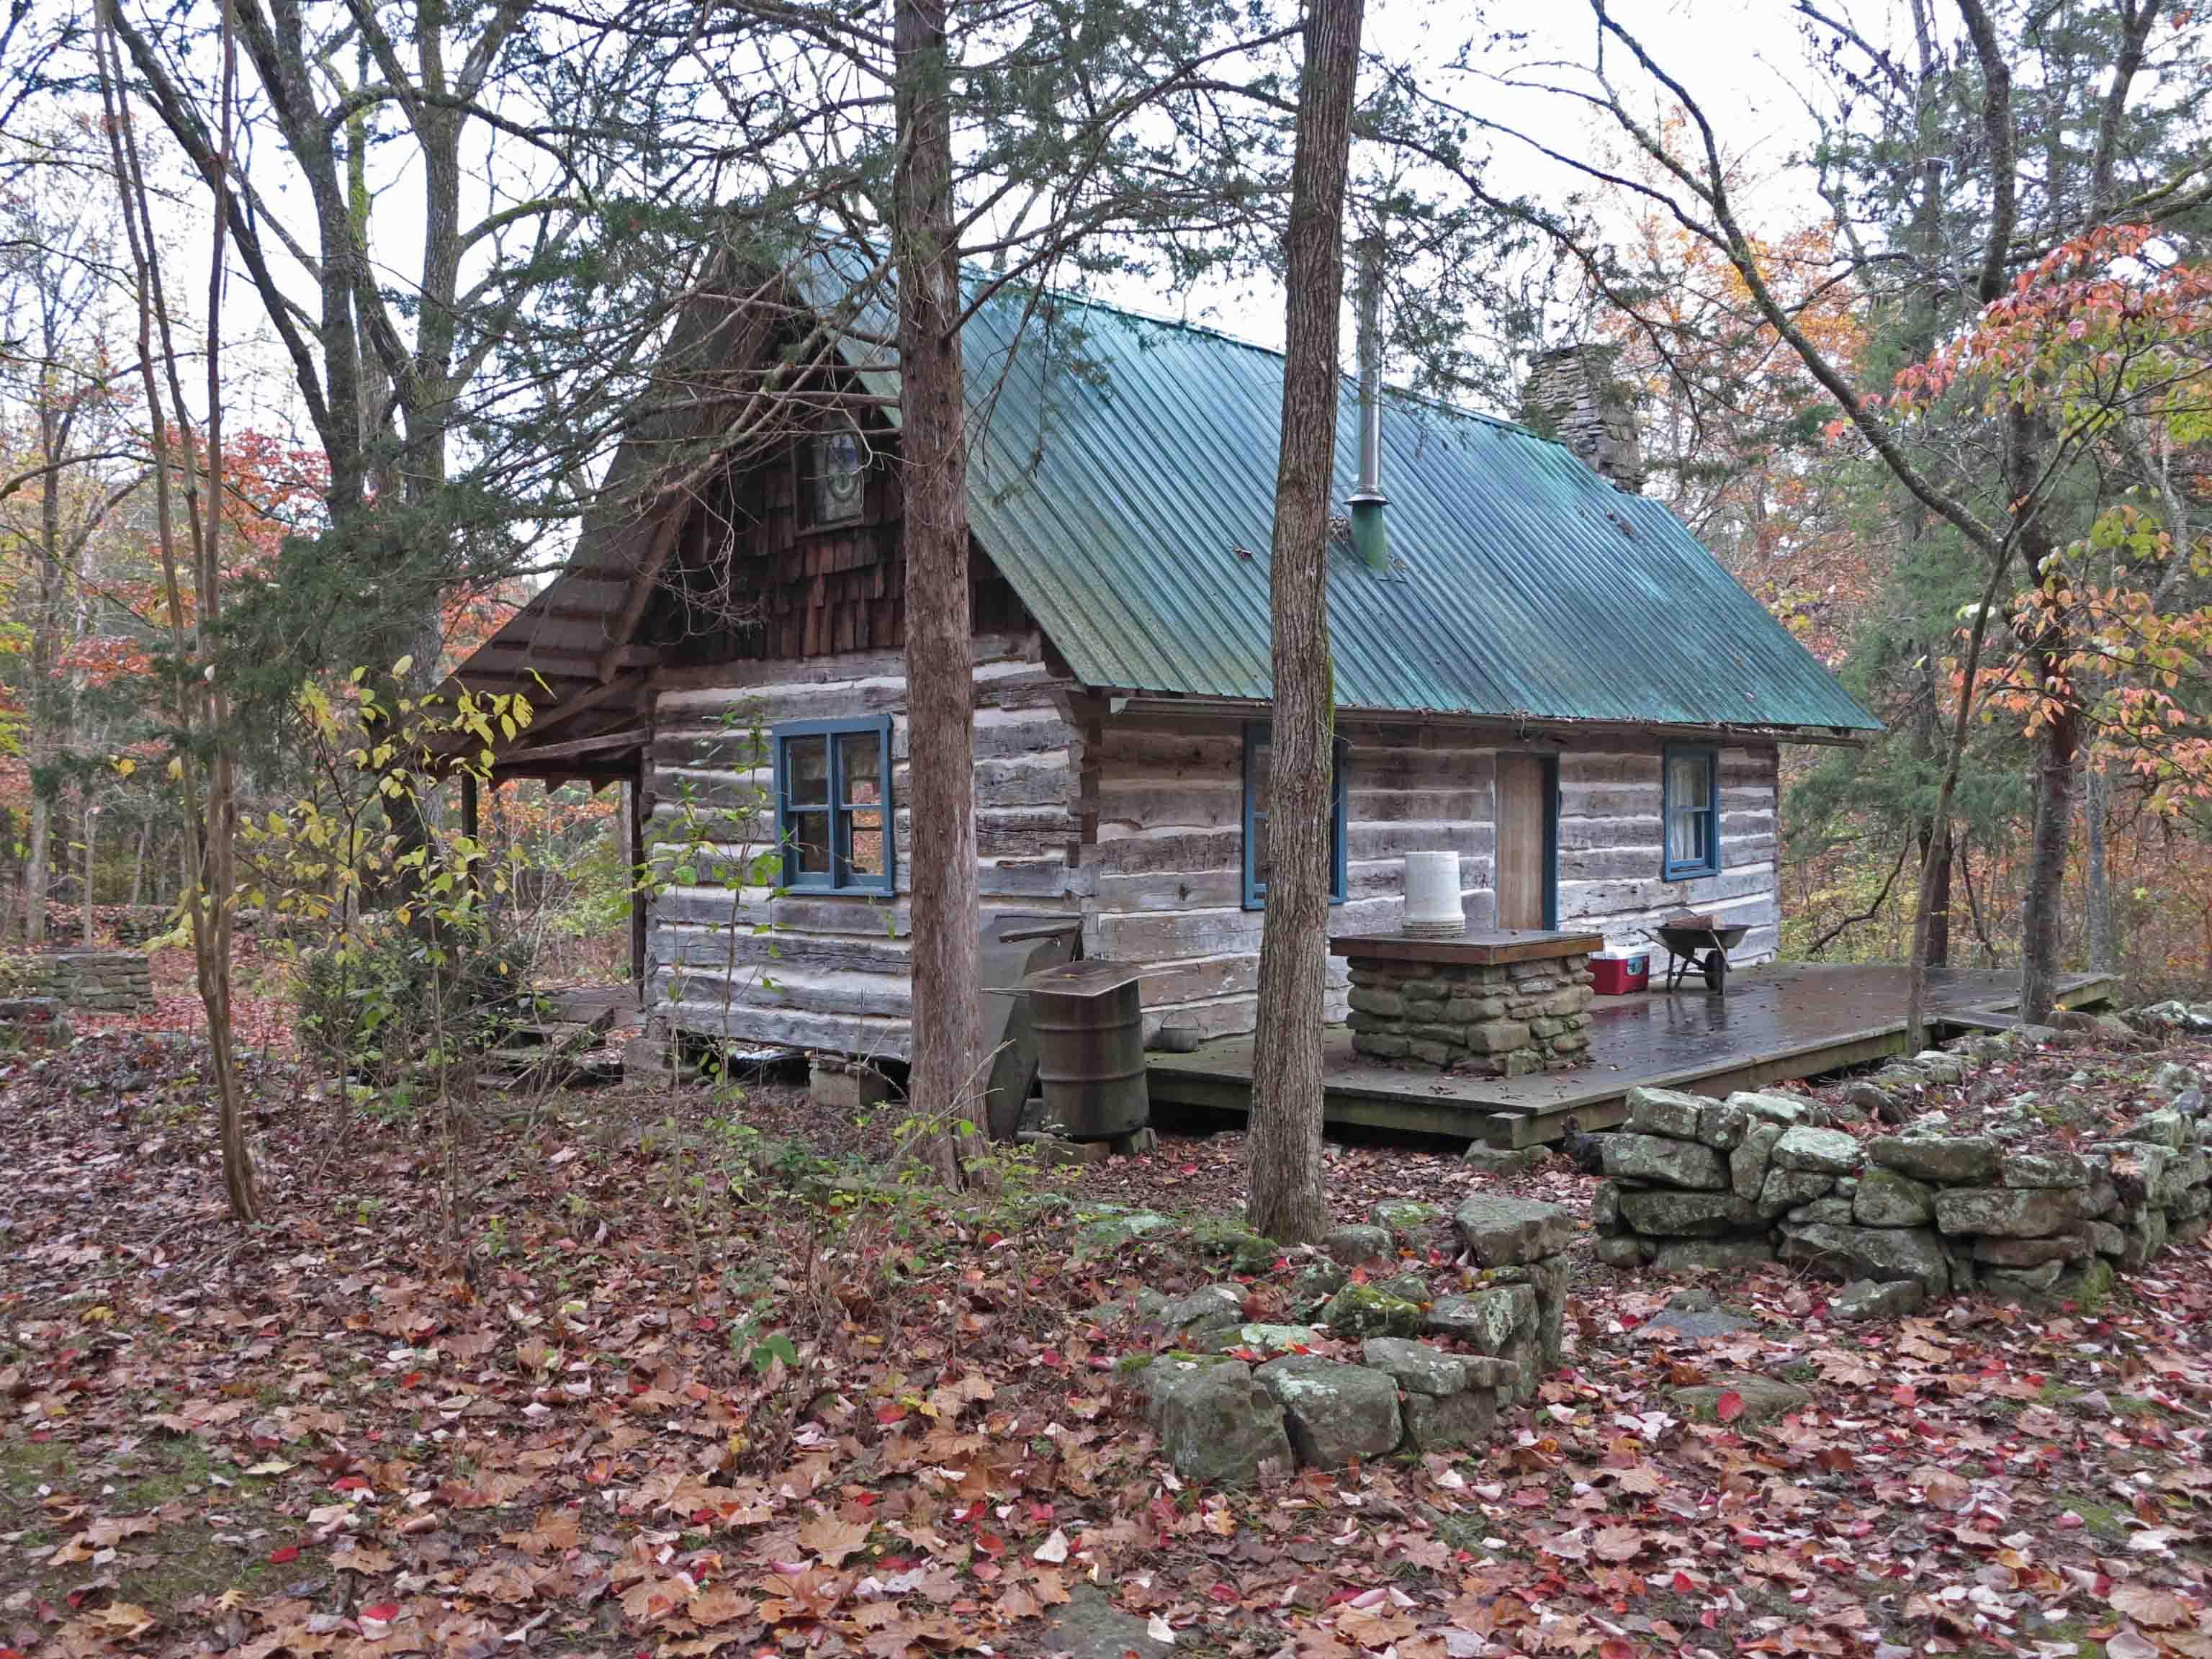 cabins big family lodge cypress the cedar lodging image ozark part en of winter mountains